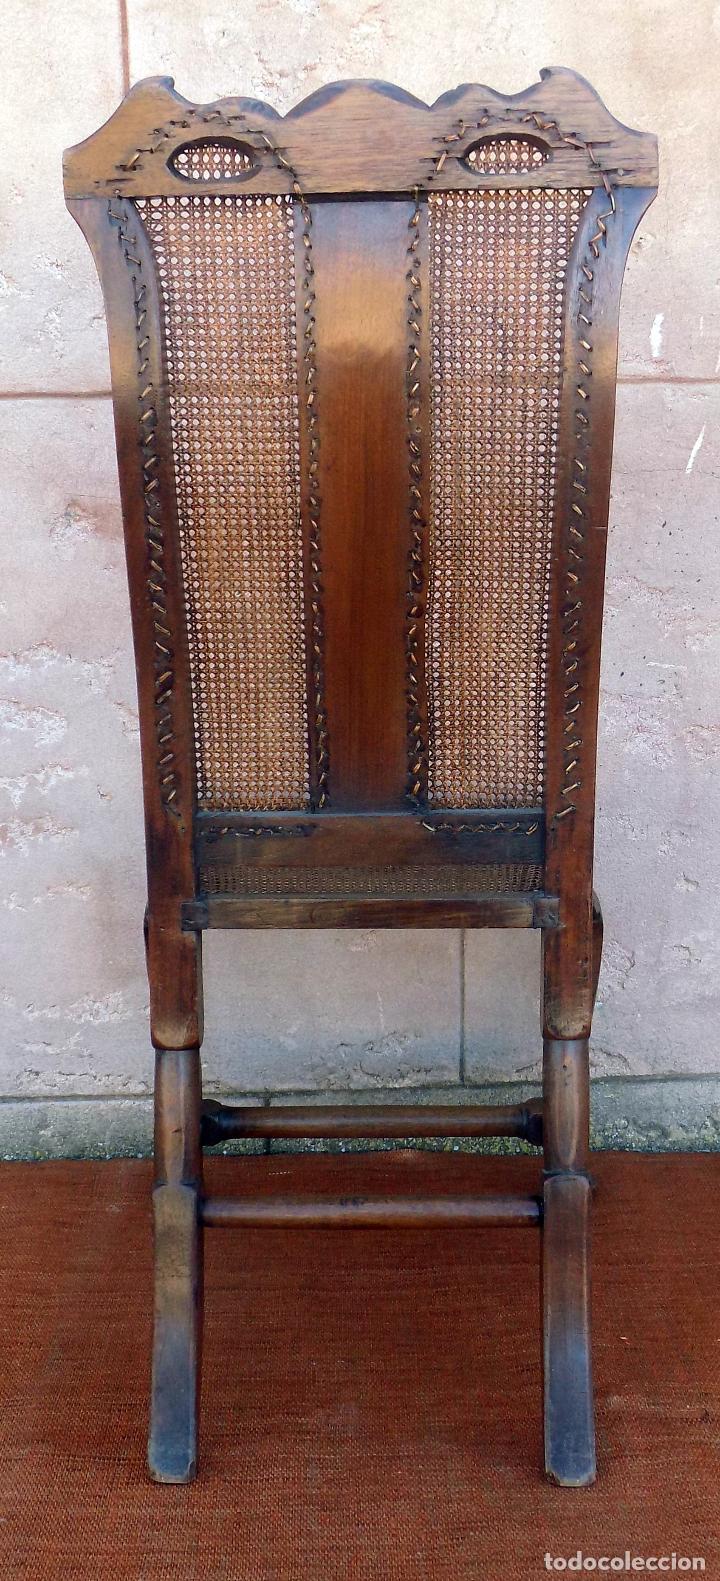 Antigüedades: SILLA. REINA ANA, REJILLA. SIGLO XVIII. ROBLE. PERFECTO ESTADO. - Foto 2 - 110299223